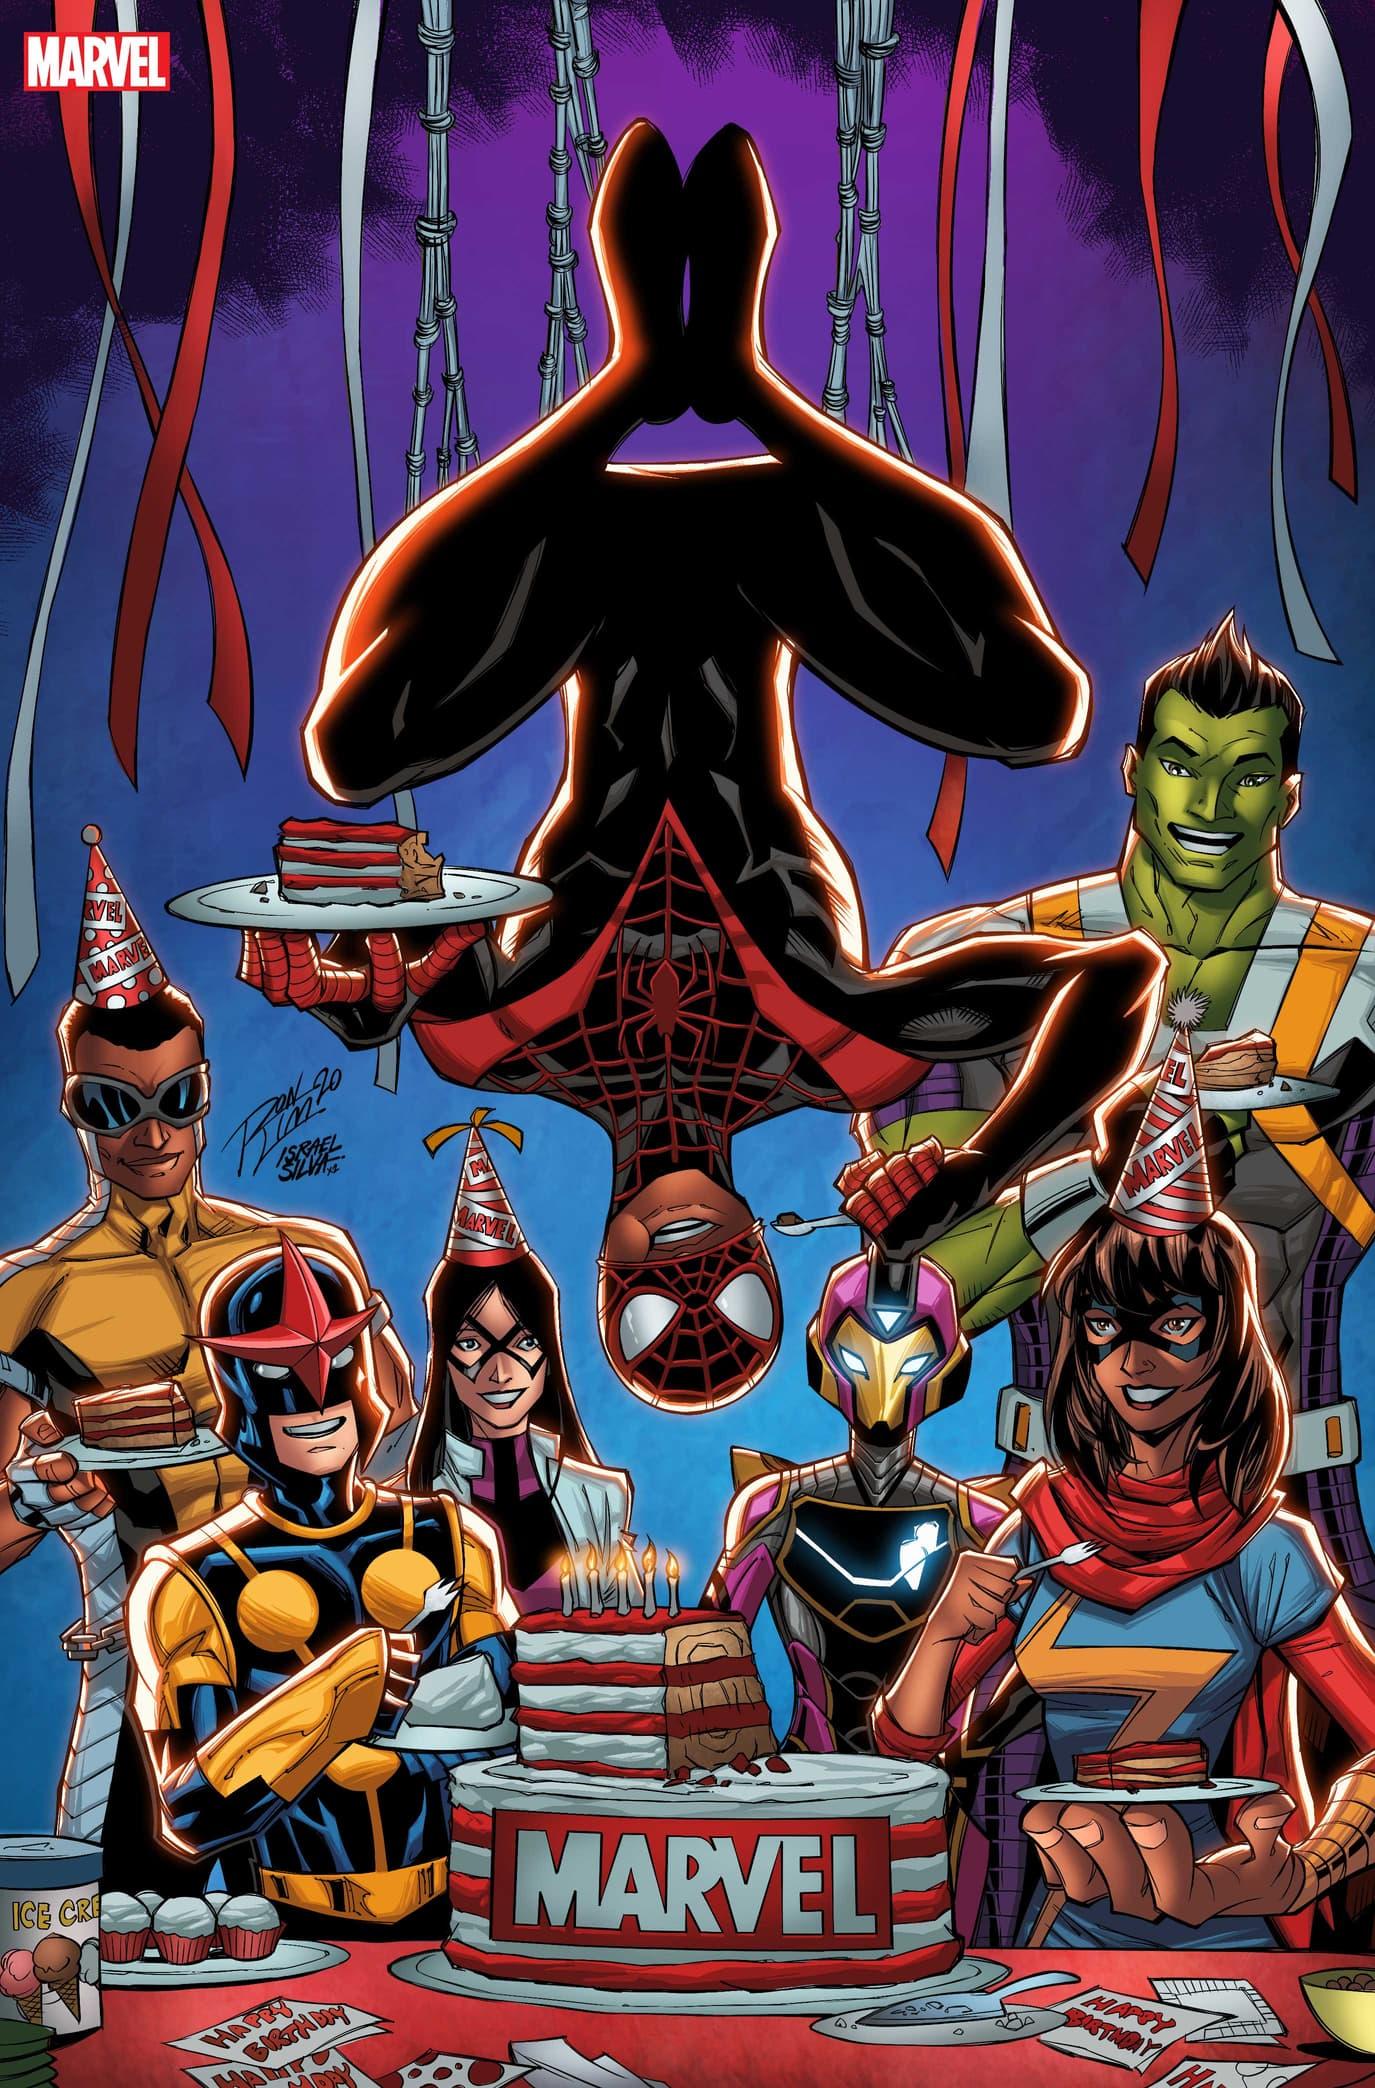 Marvel 81st Birthday Art by Ron Lim